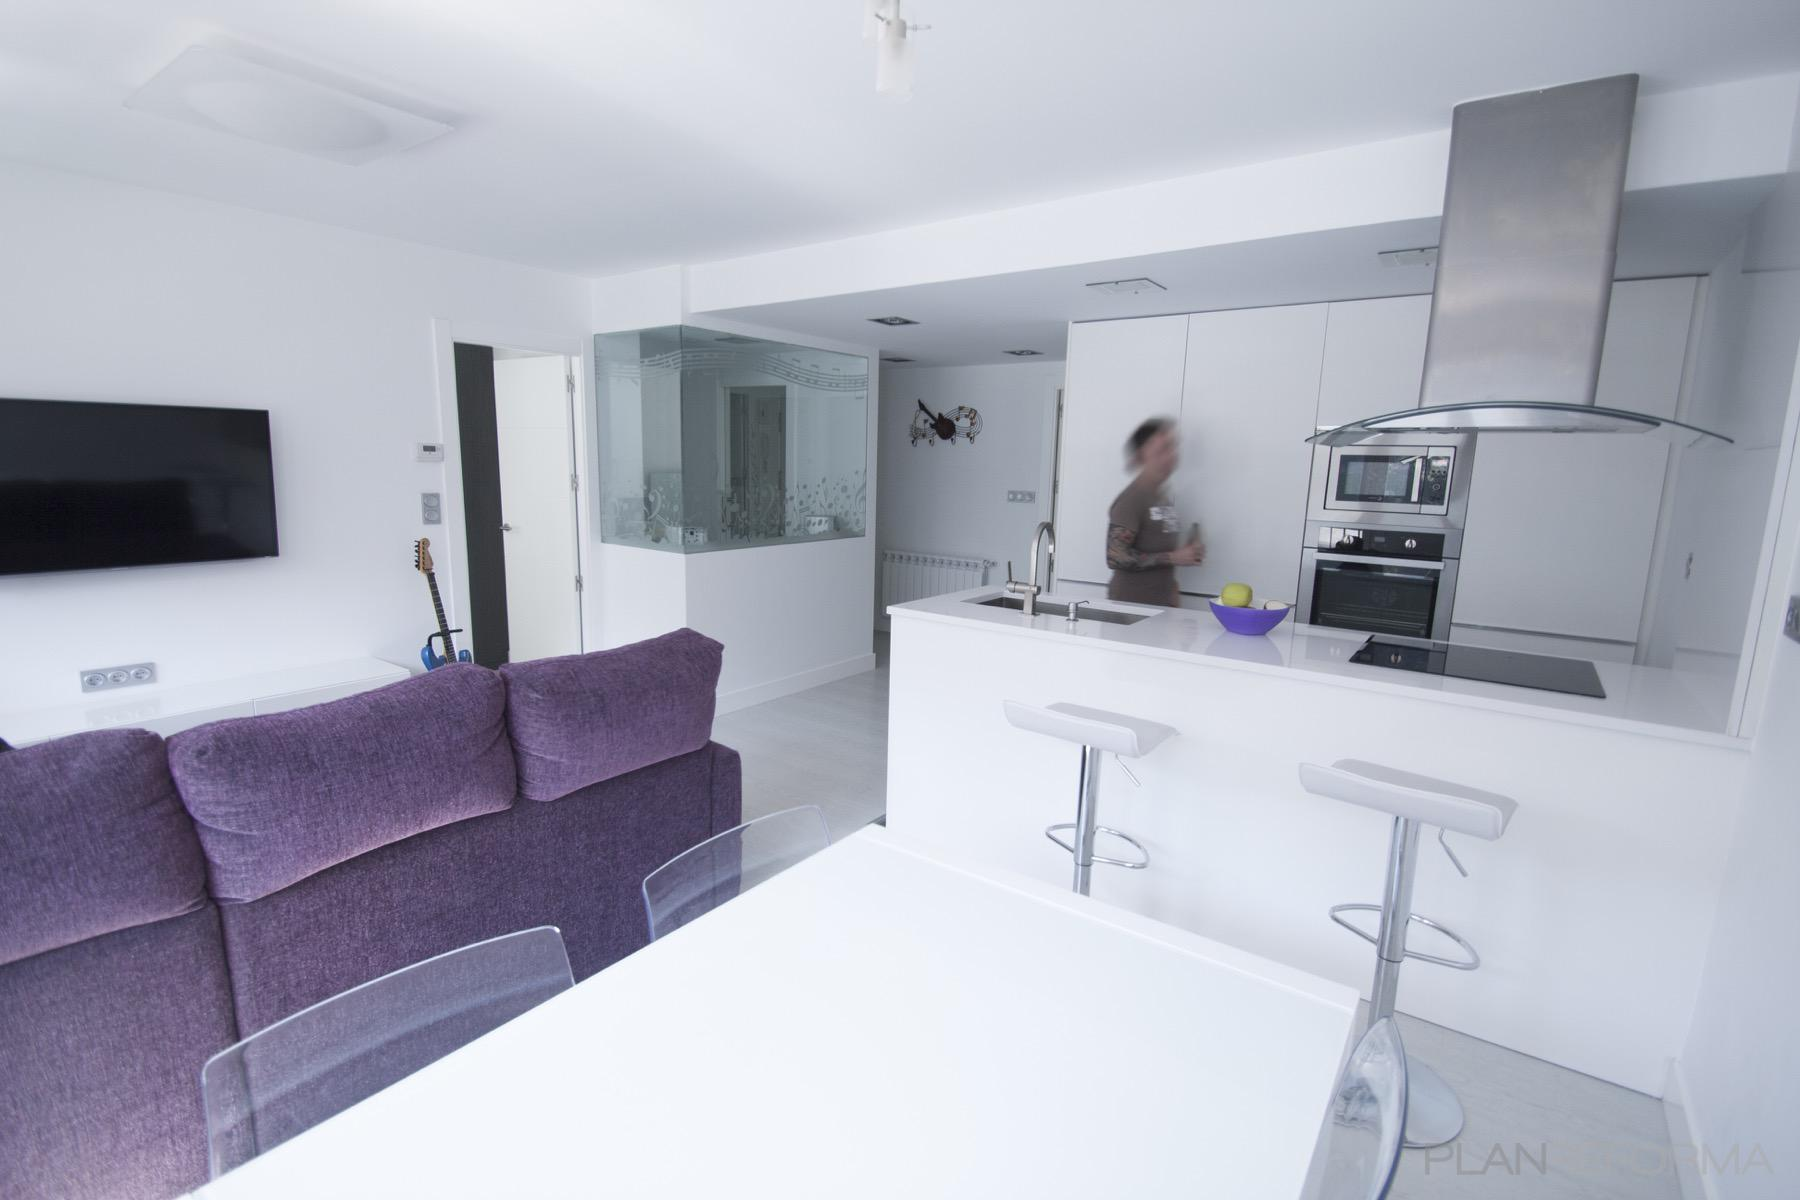 Comedor cocina salon estilo moderno color violeta - Cocina salon comedor ...